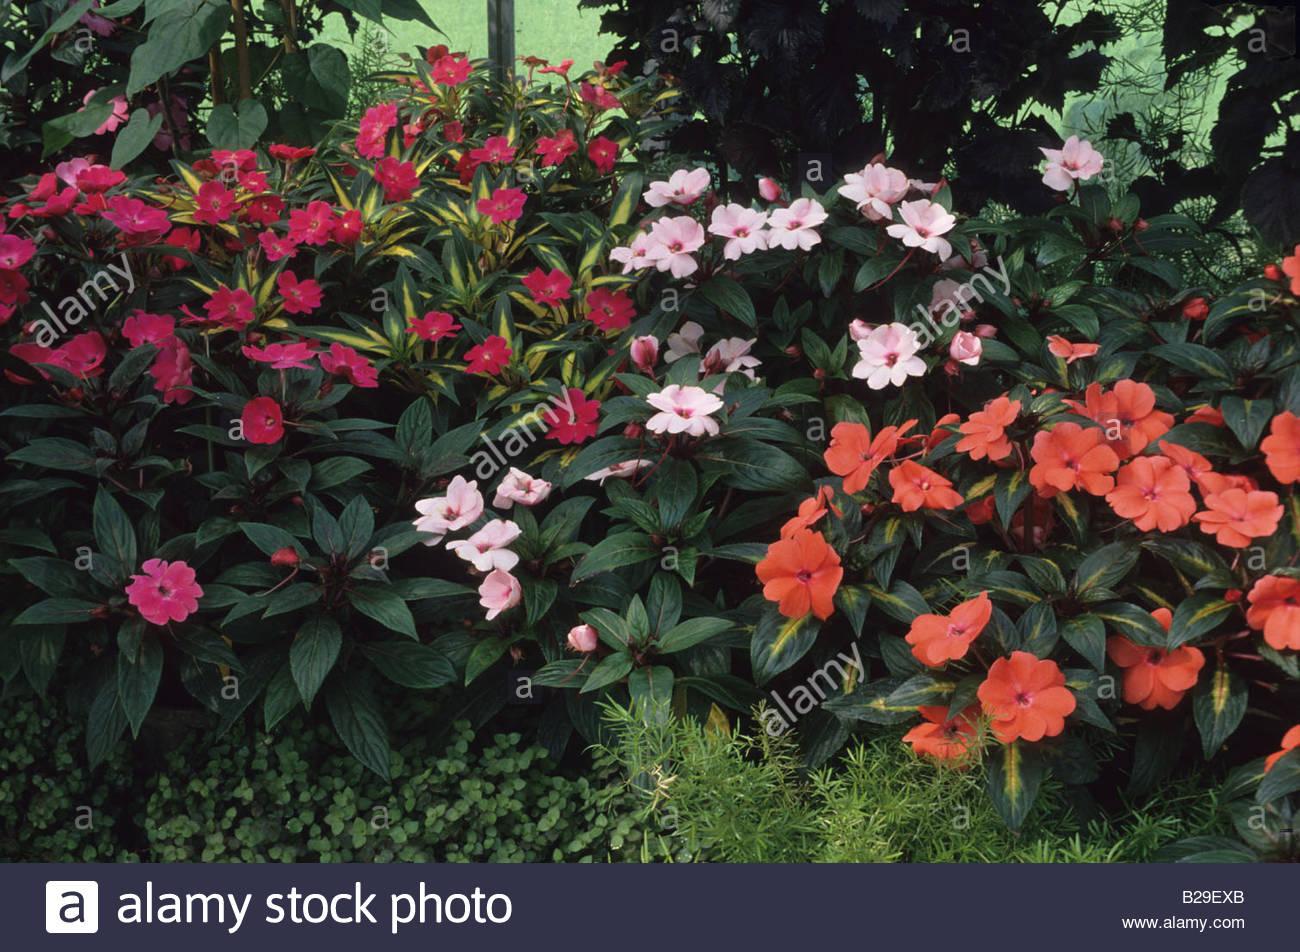 Shade Loving Perennials Impatiens New Guinea Hybrids Stock Photo